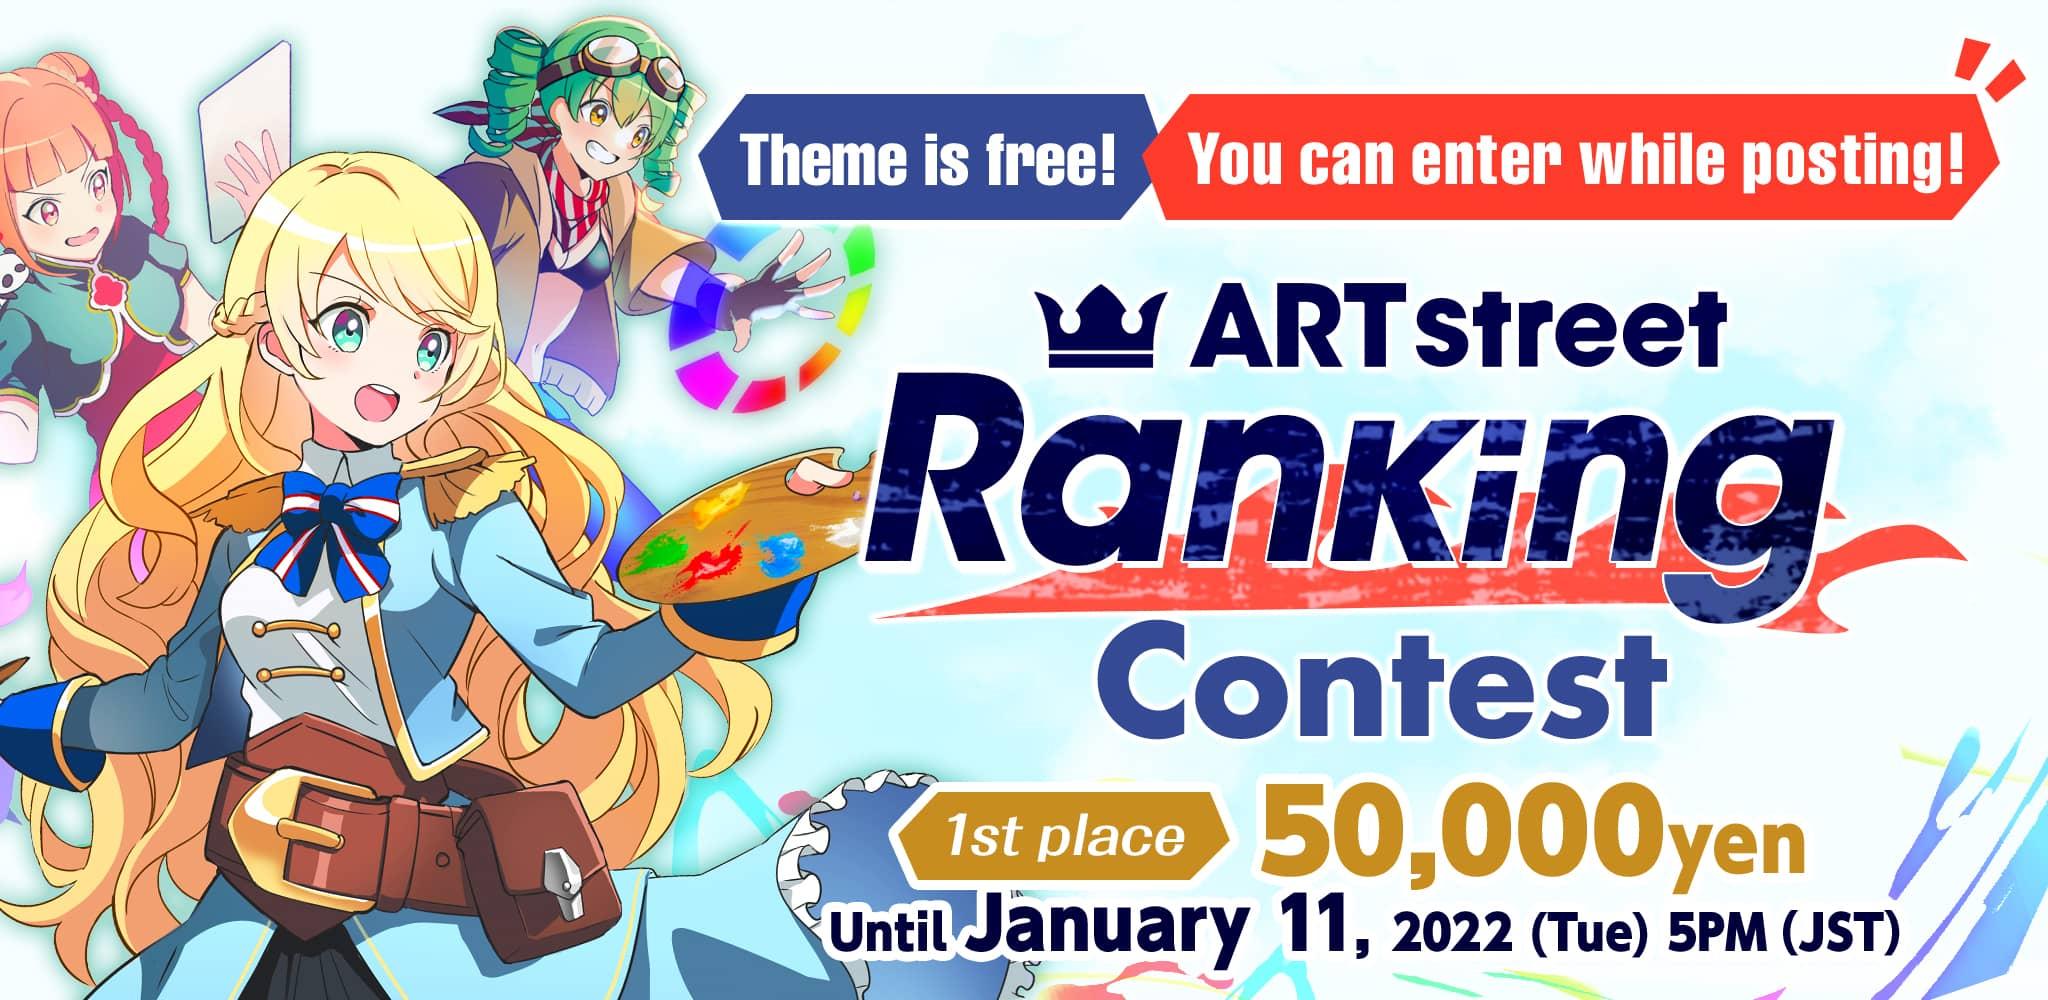 ART street Ranking Contest   Contest - ART street by MediBang